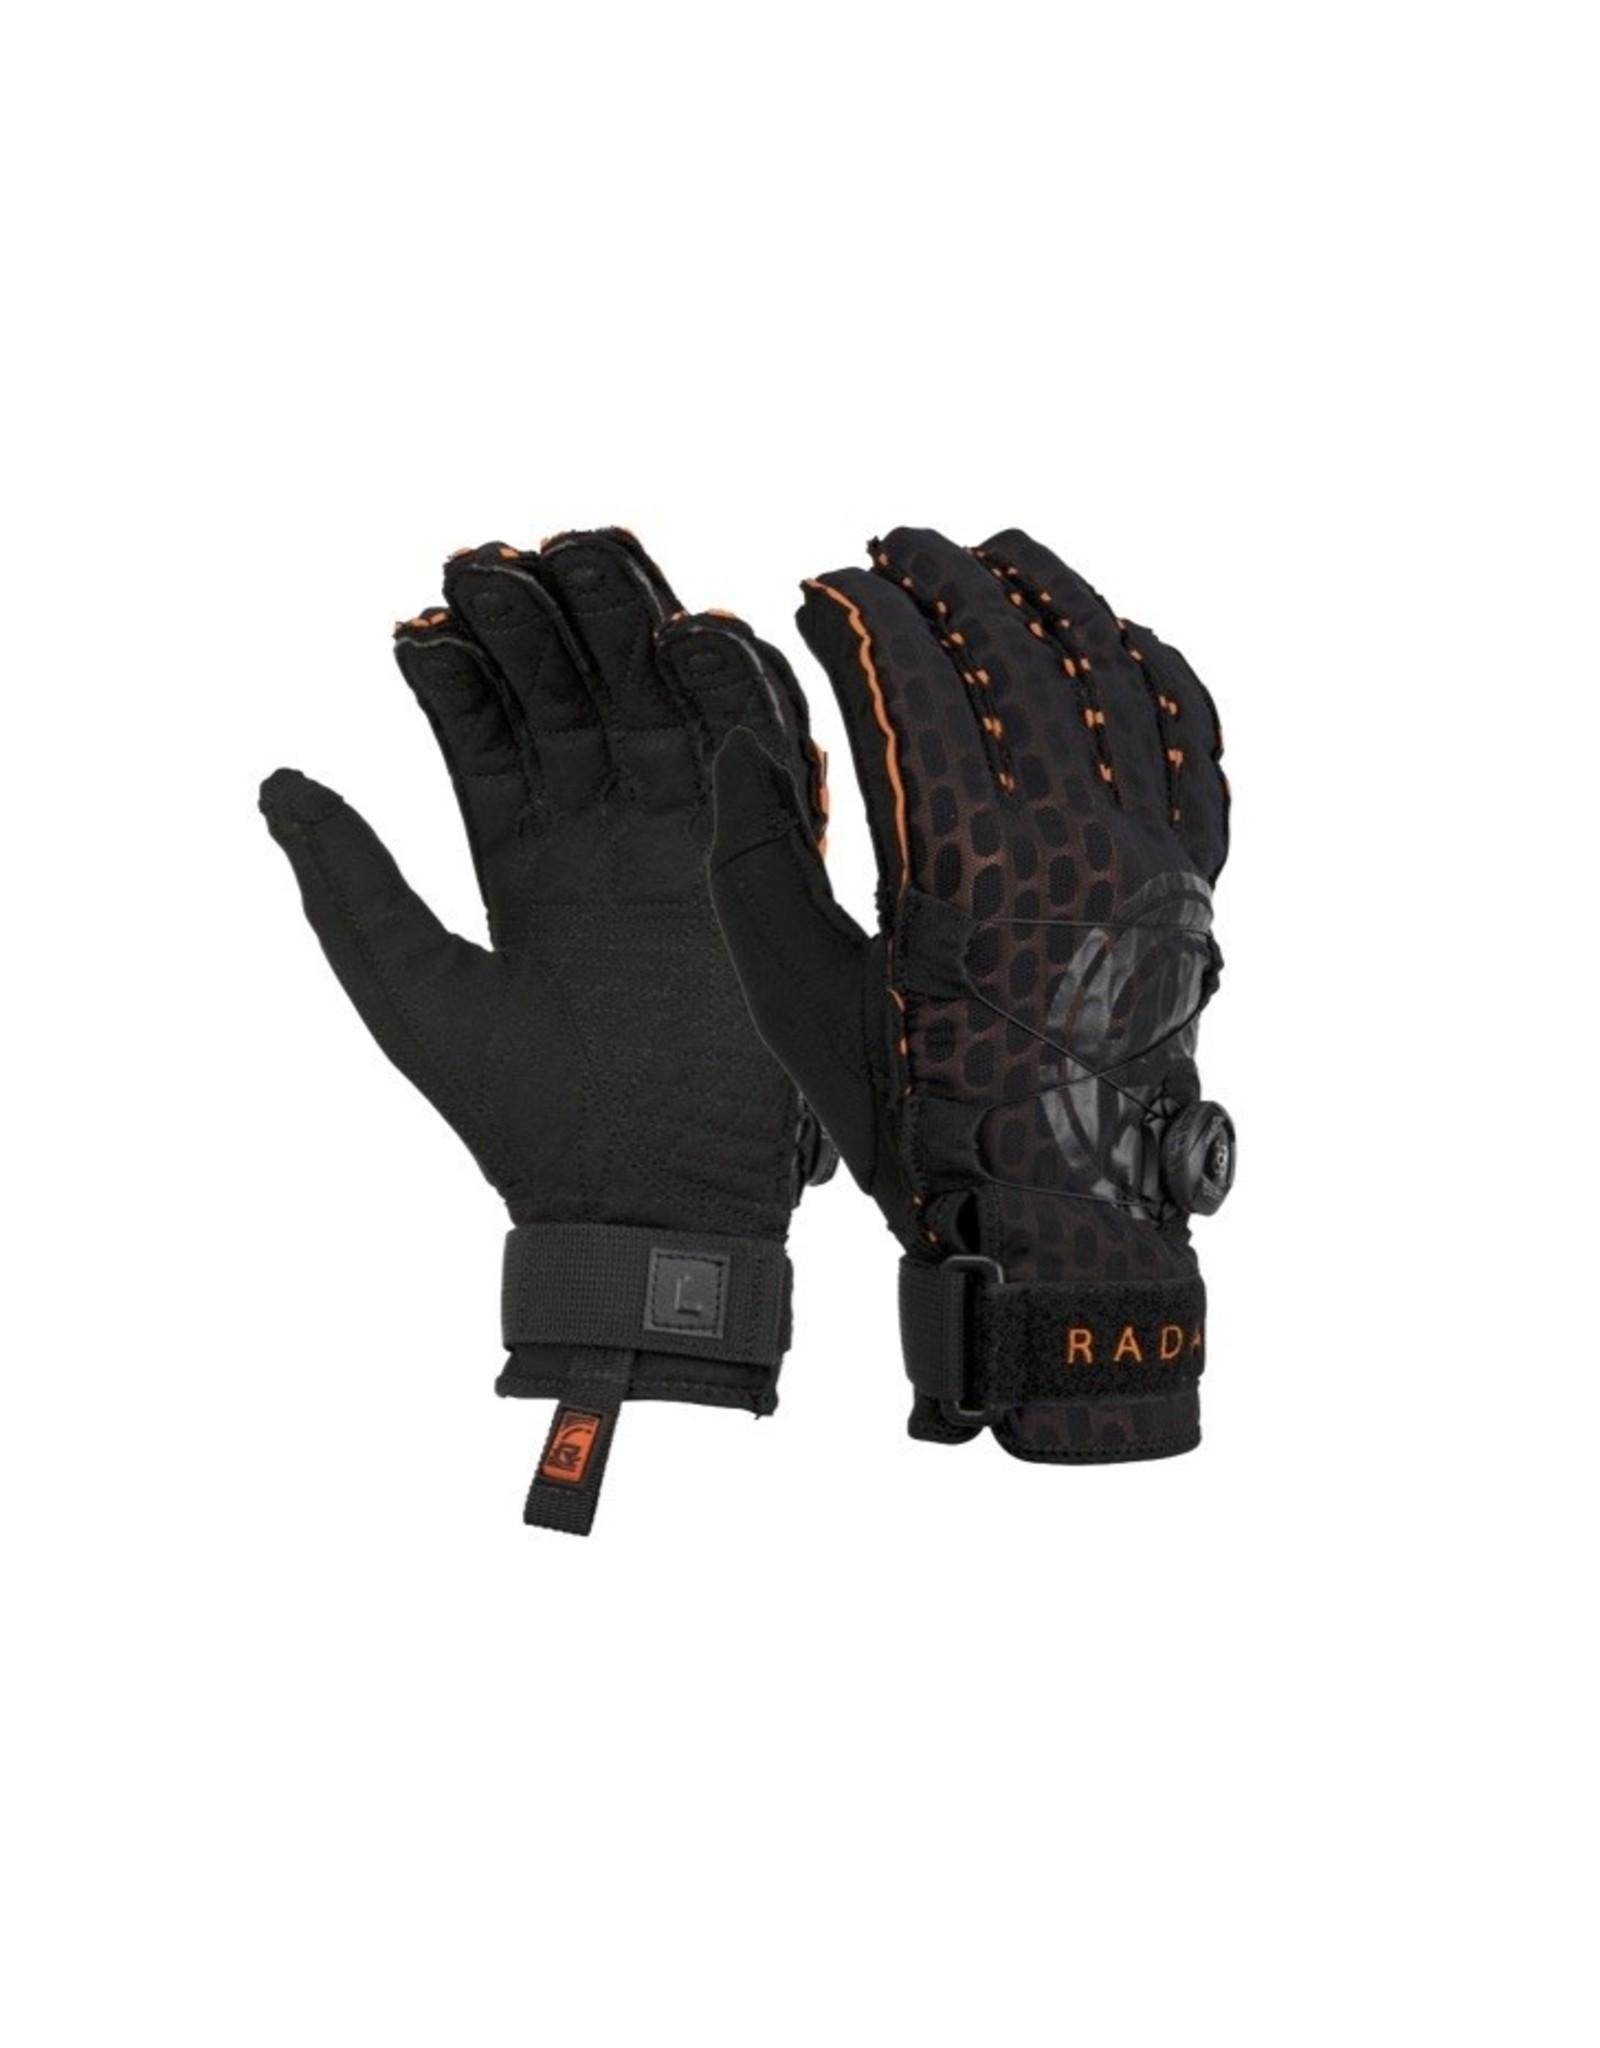 Radar Vapor A BOA Inside-Out Glove 2019